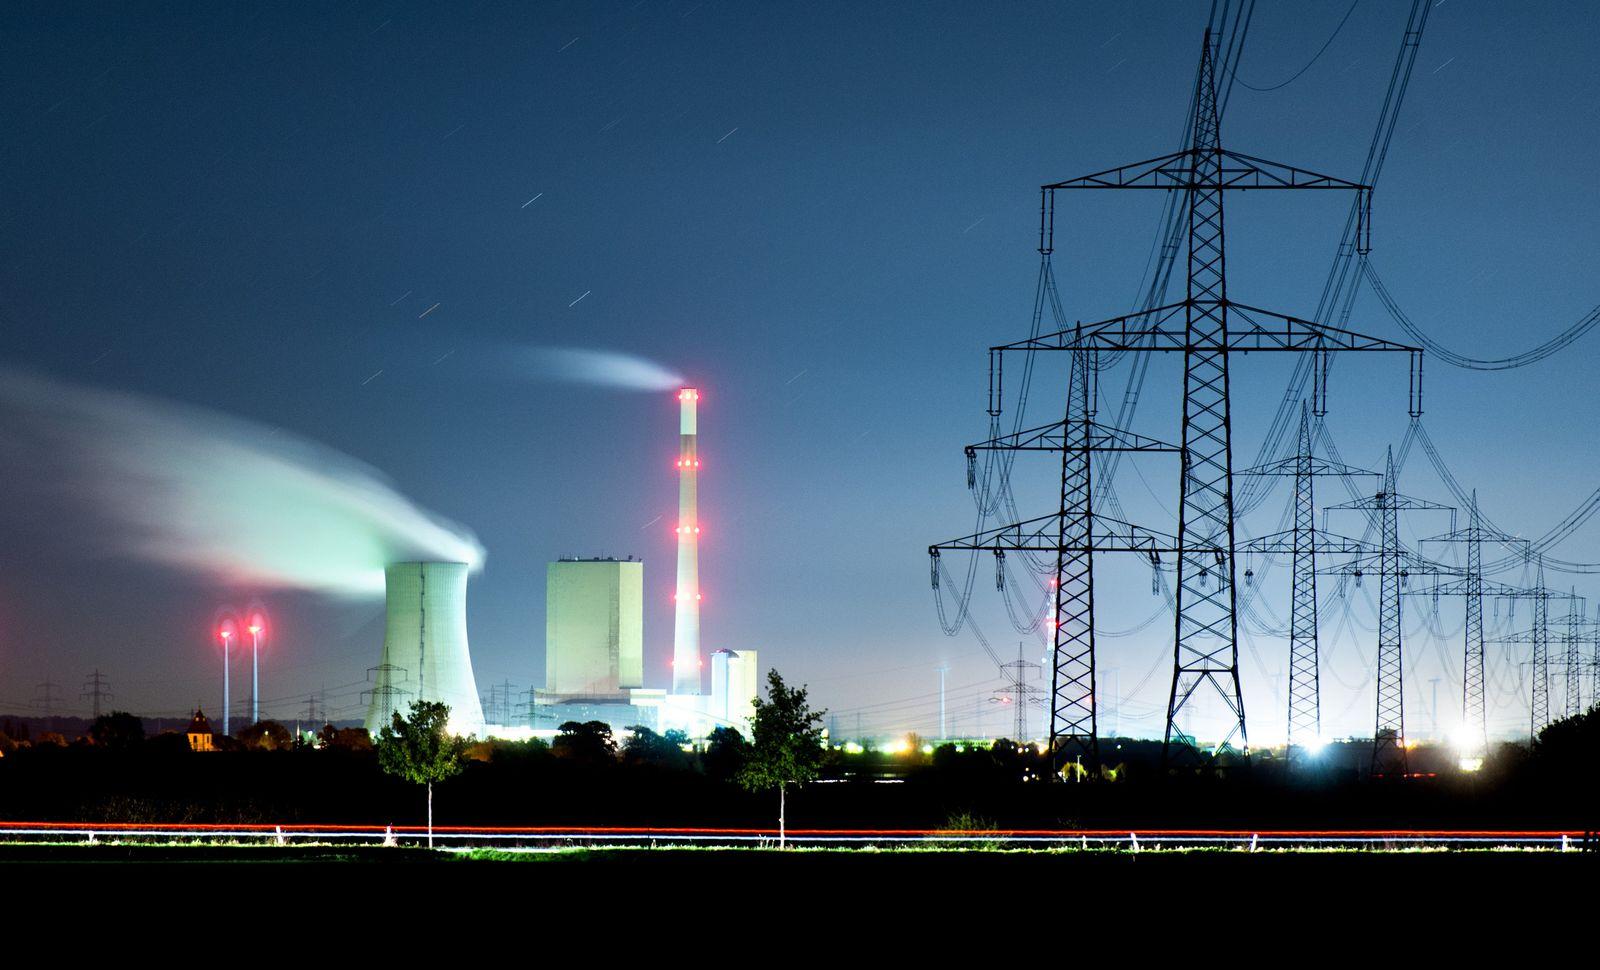 Kraftwerk/ Stromtrasse